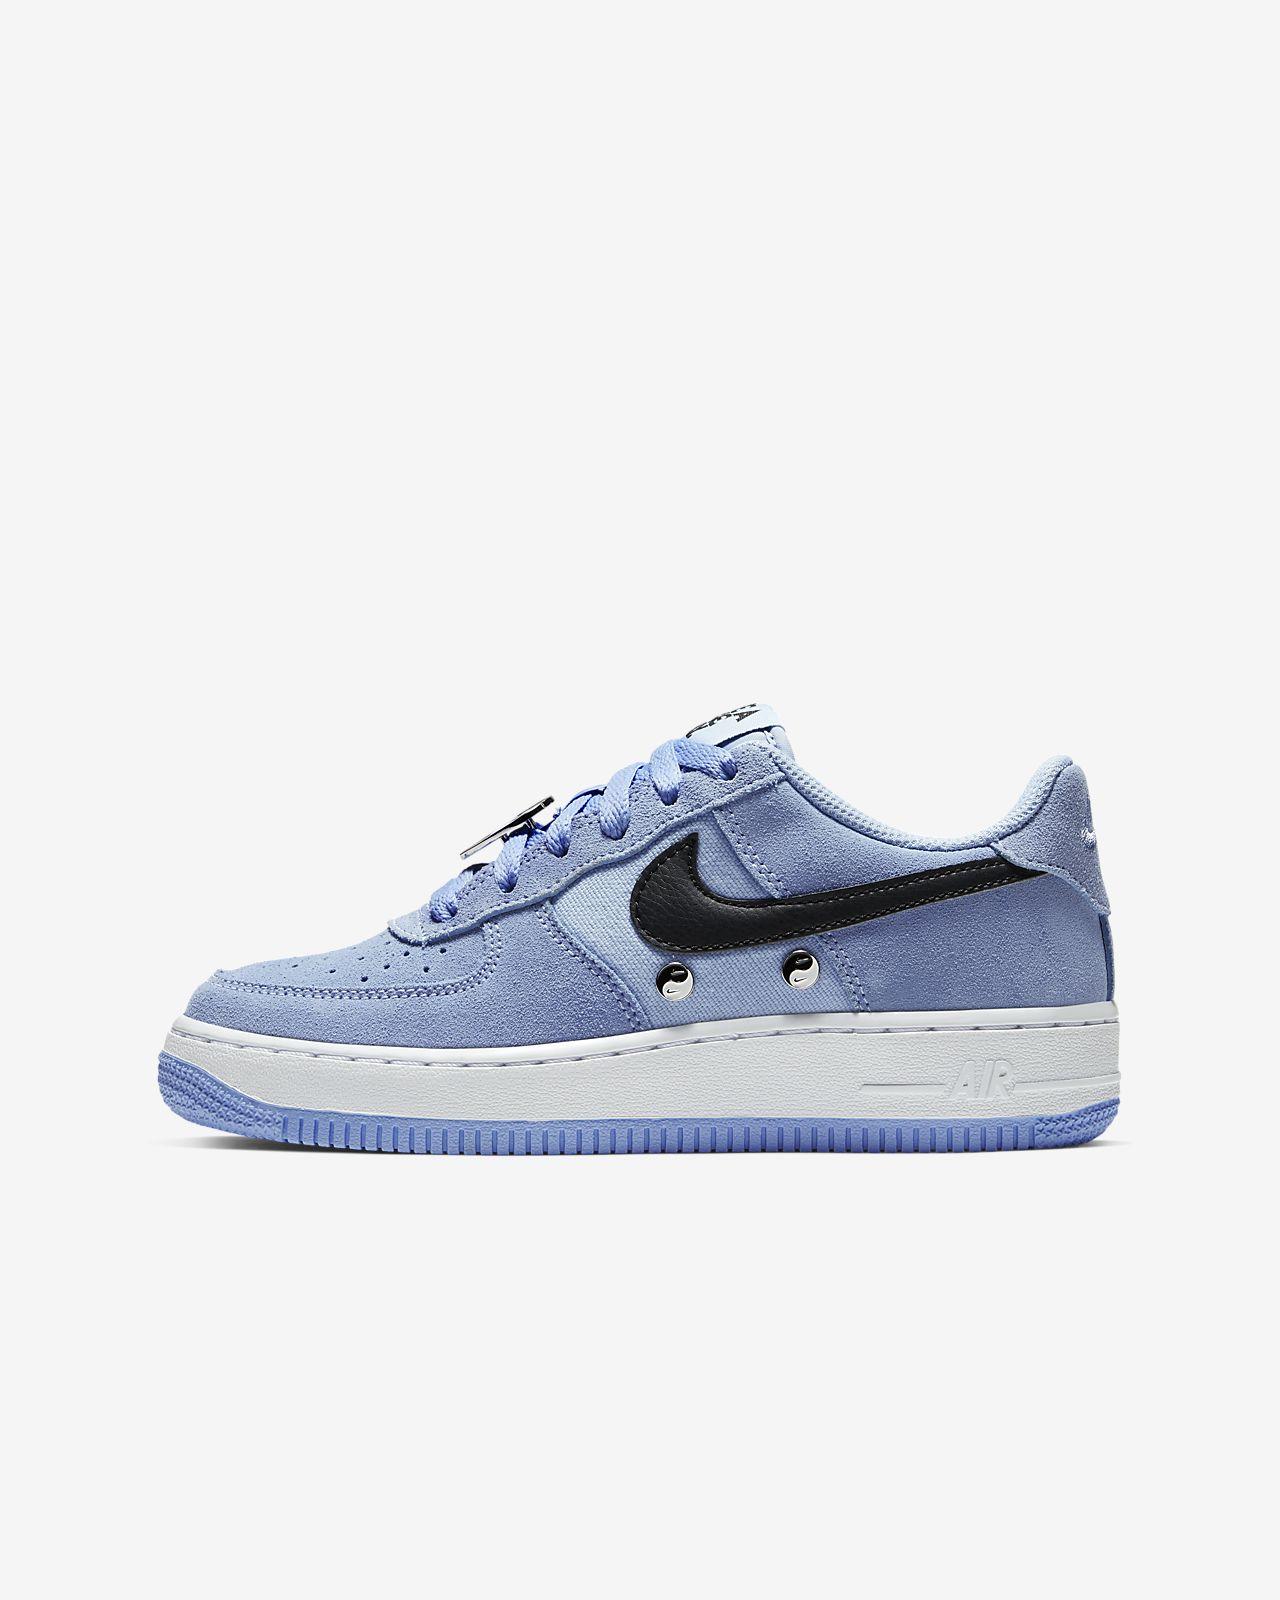 size 40 3db02 bff96 ... Nike Air Force 1 LV8 Schuh für ältere Kinder